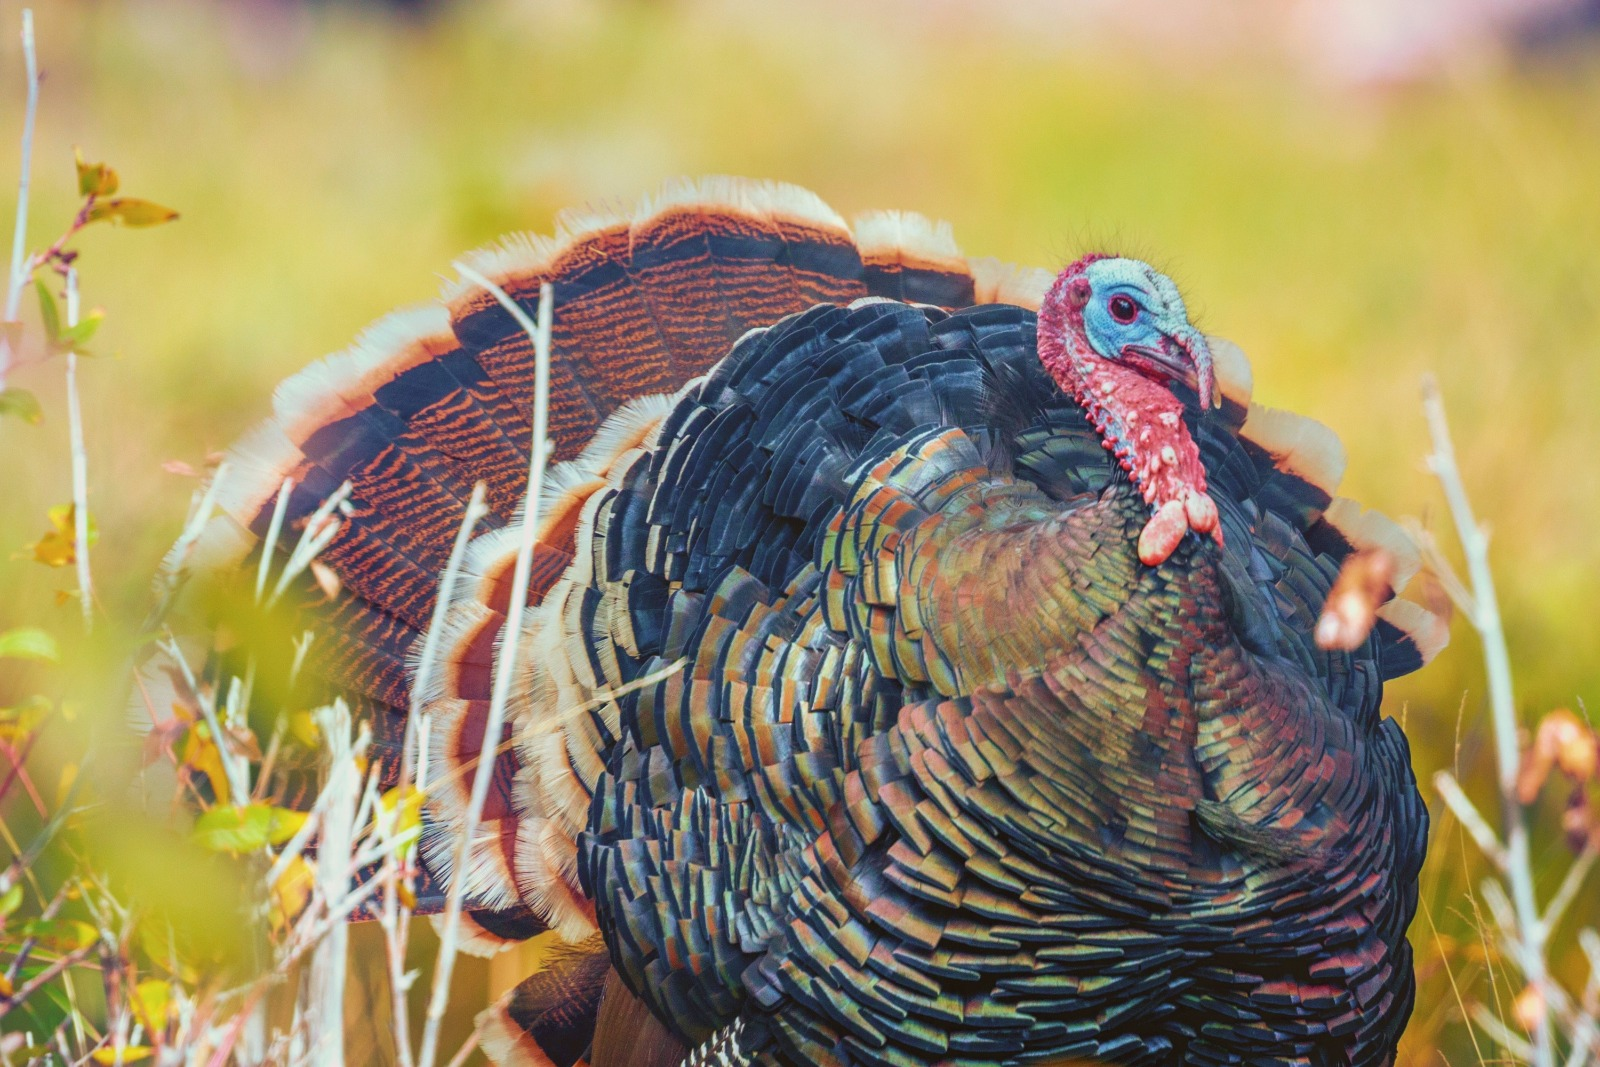 Turkeys: the cruelty behind Christmas dinner